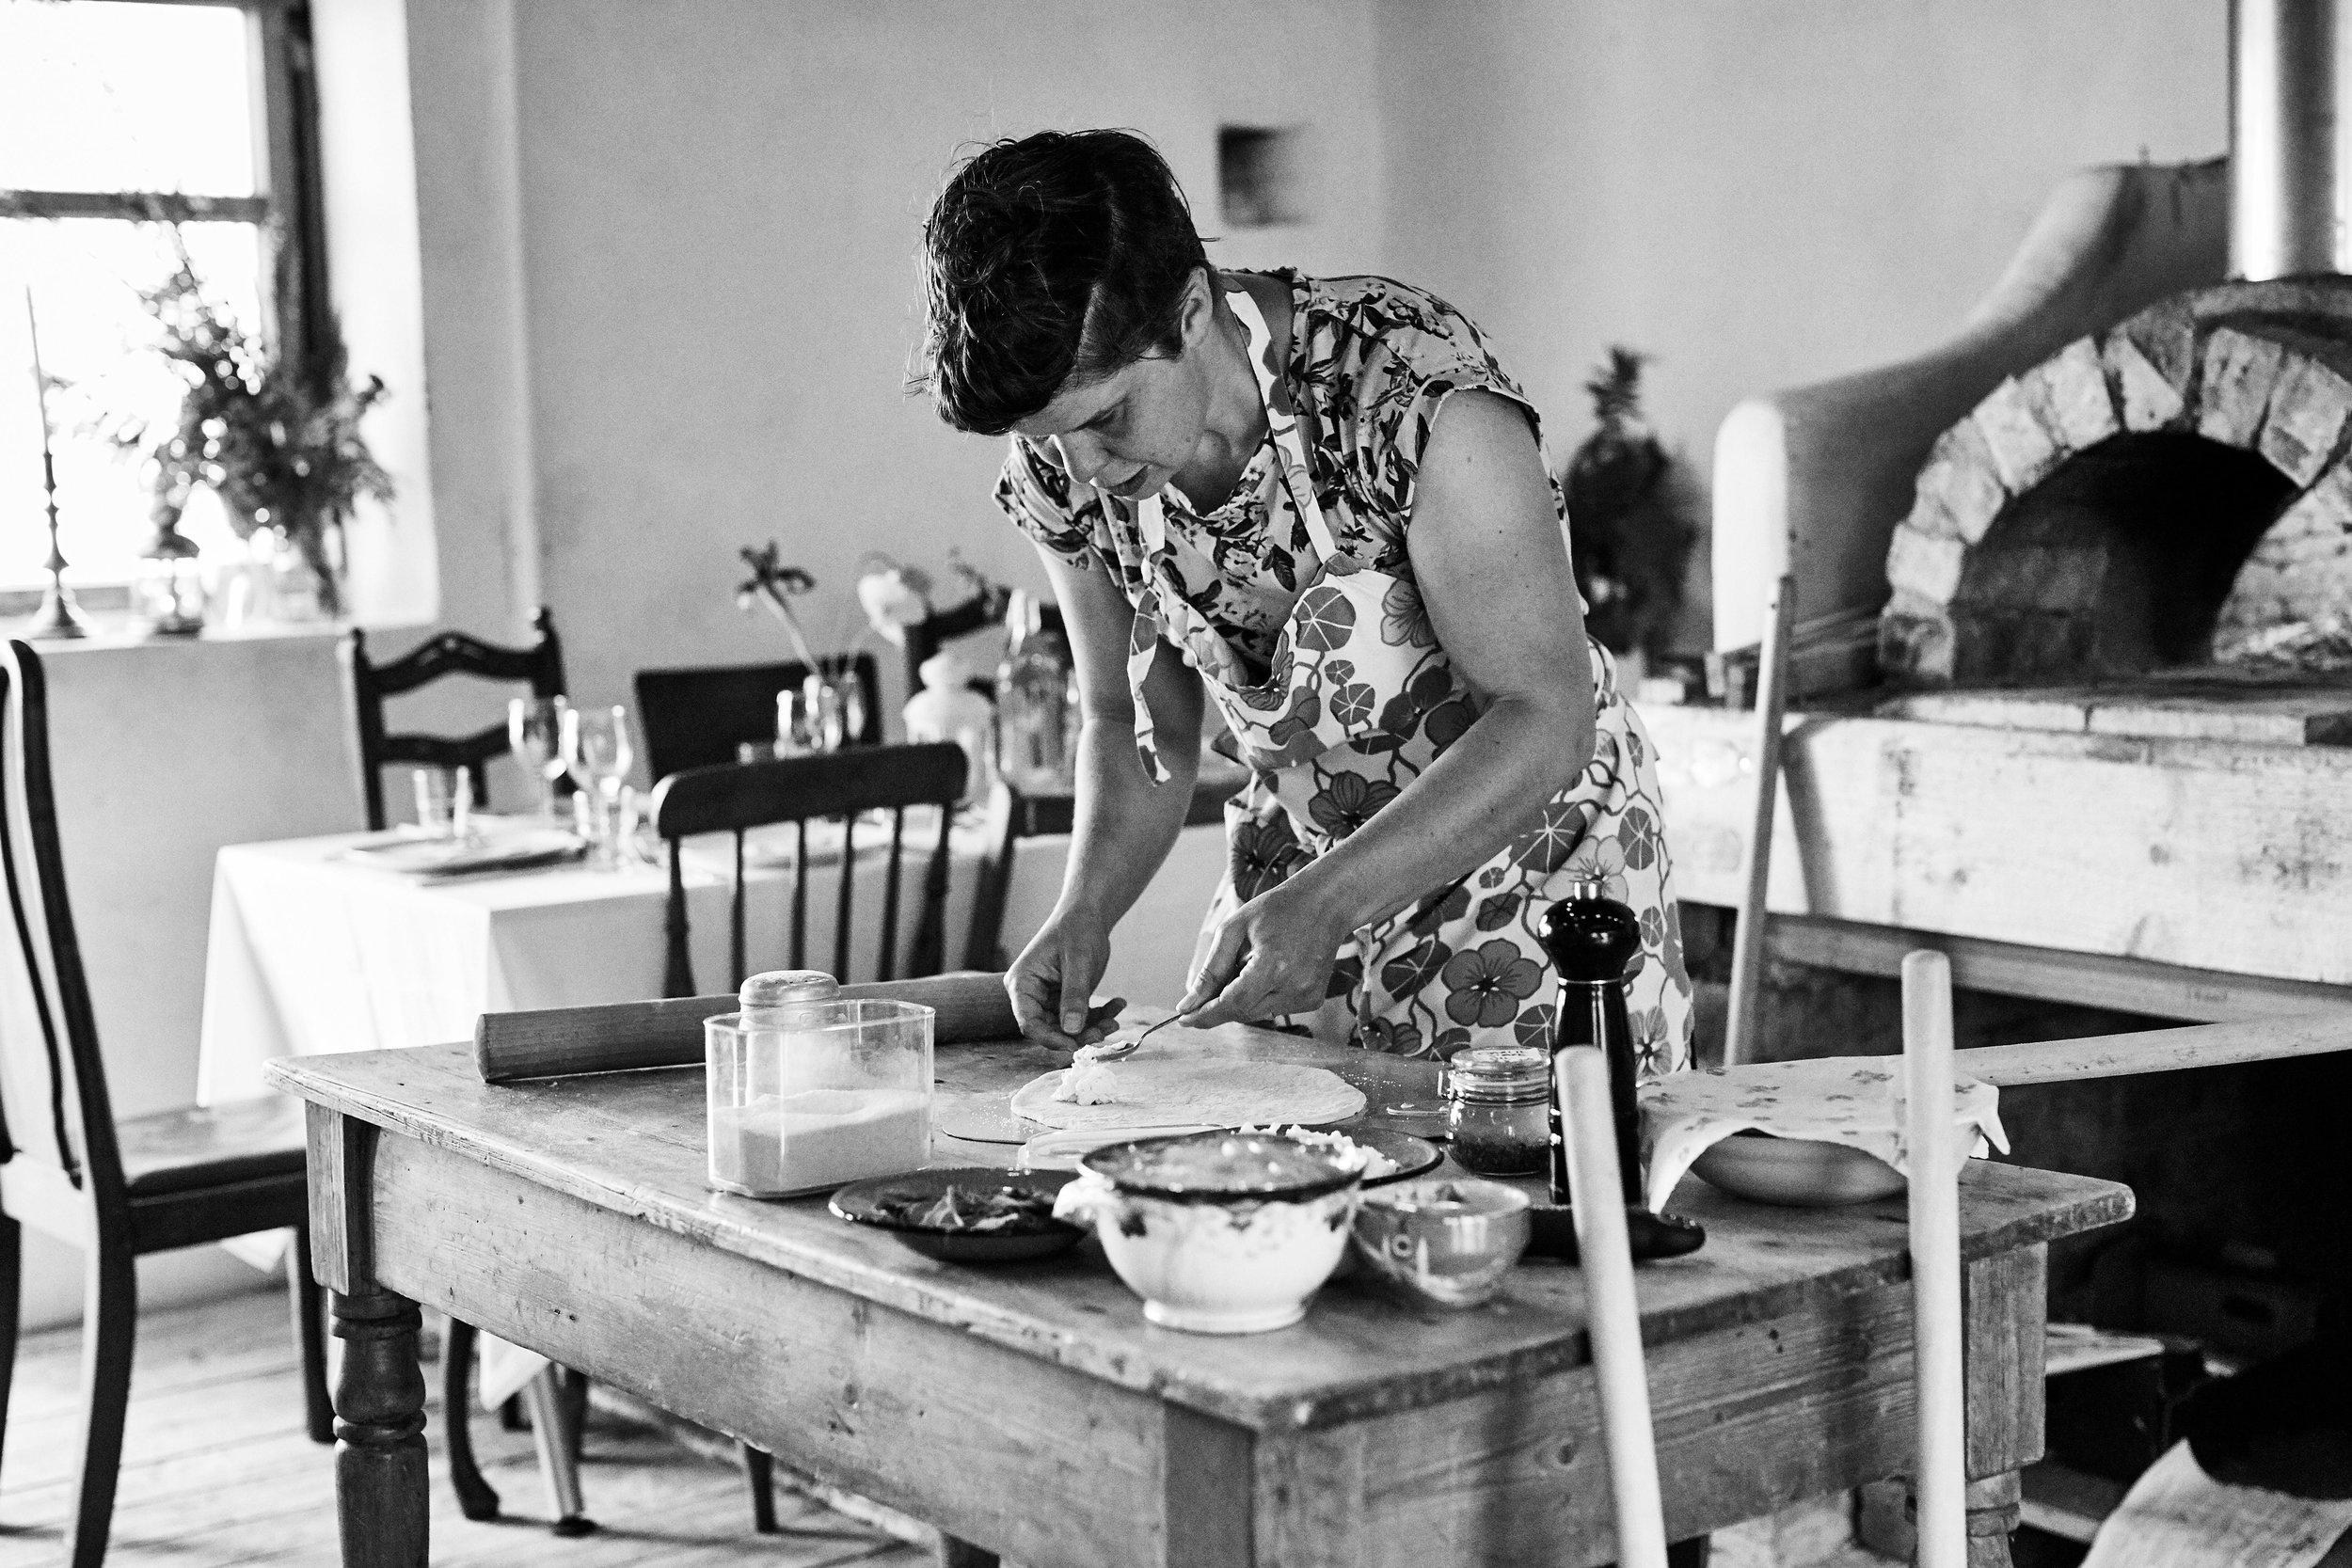 Jo working her magic on some flatbread dough